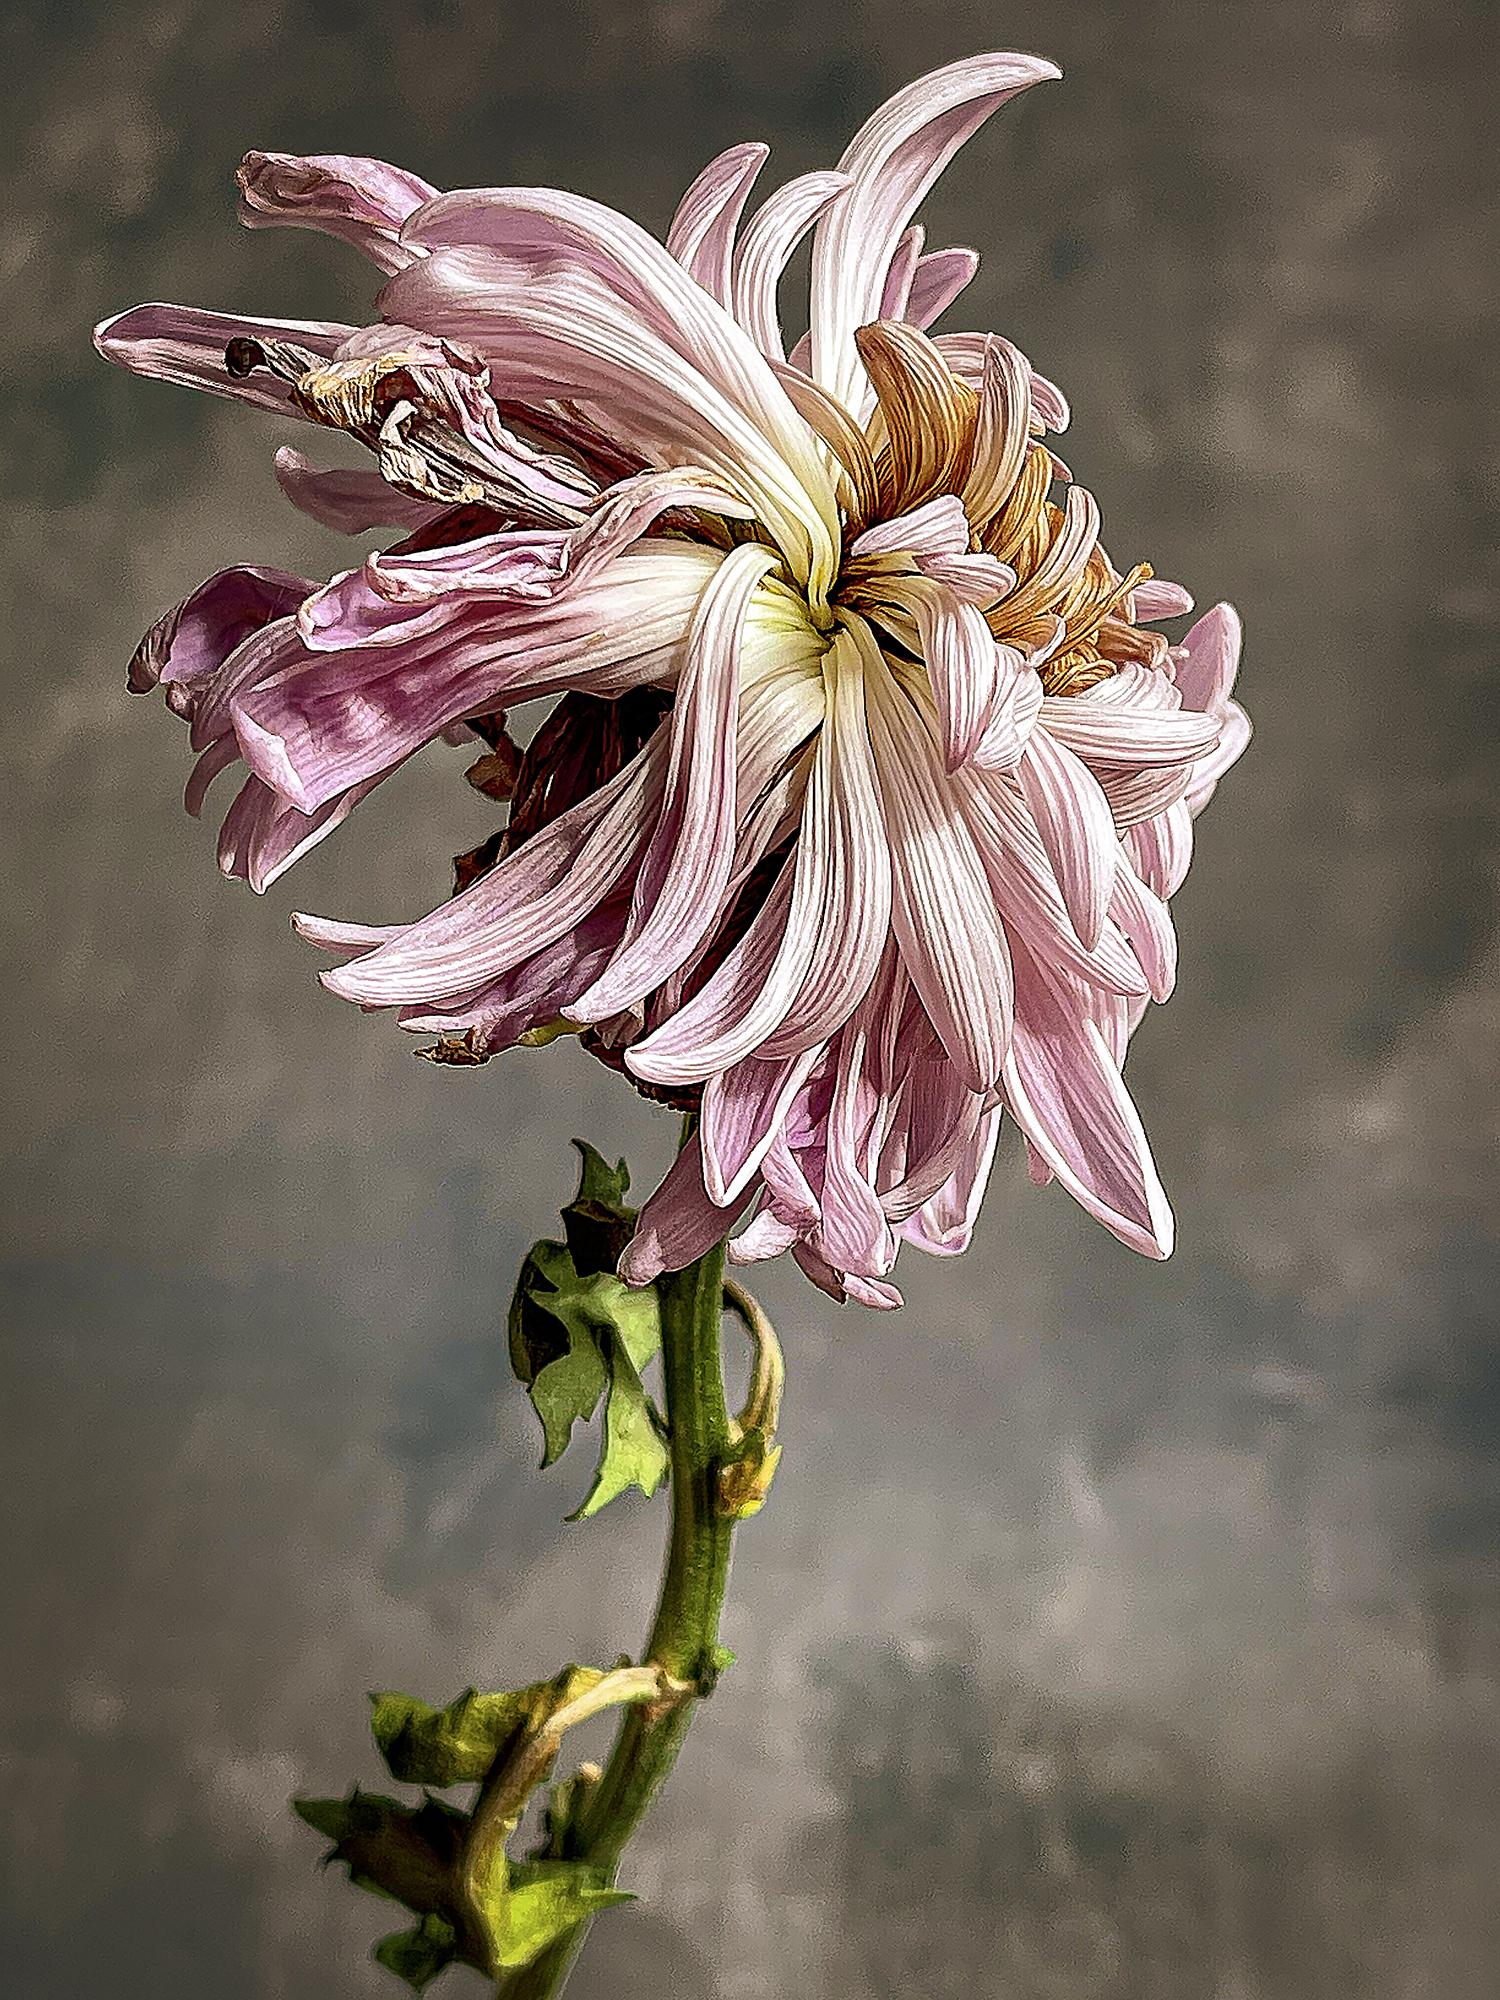 © Holly Romano | Unseen Beauty